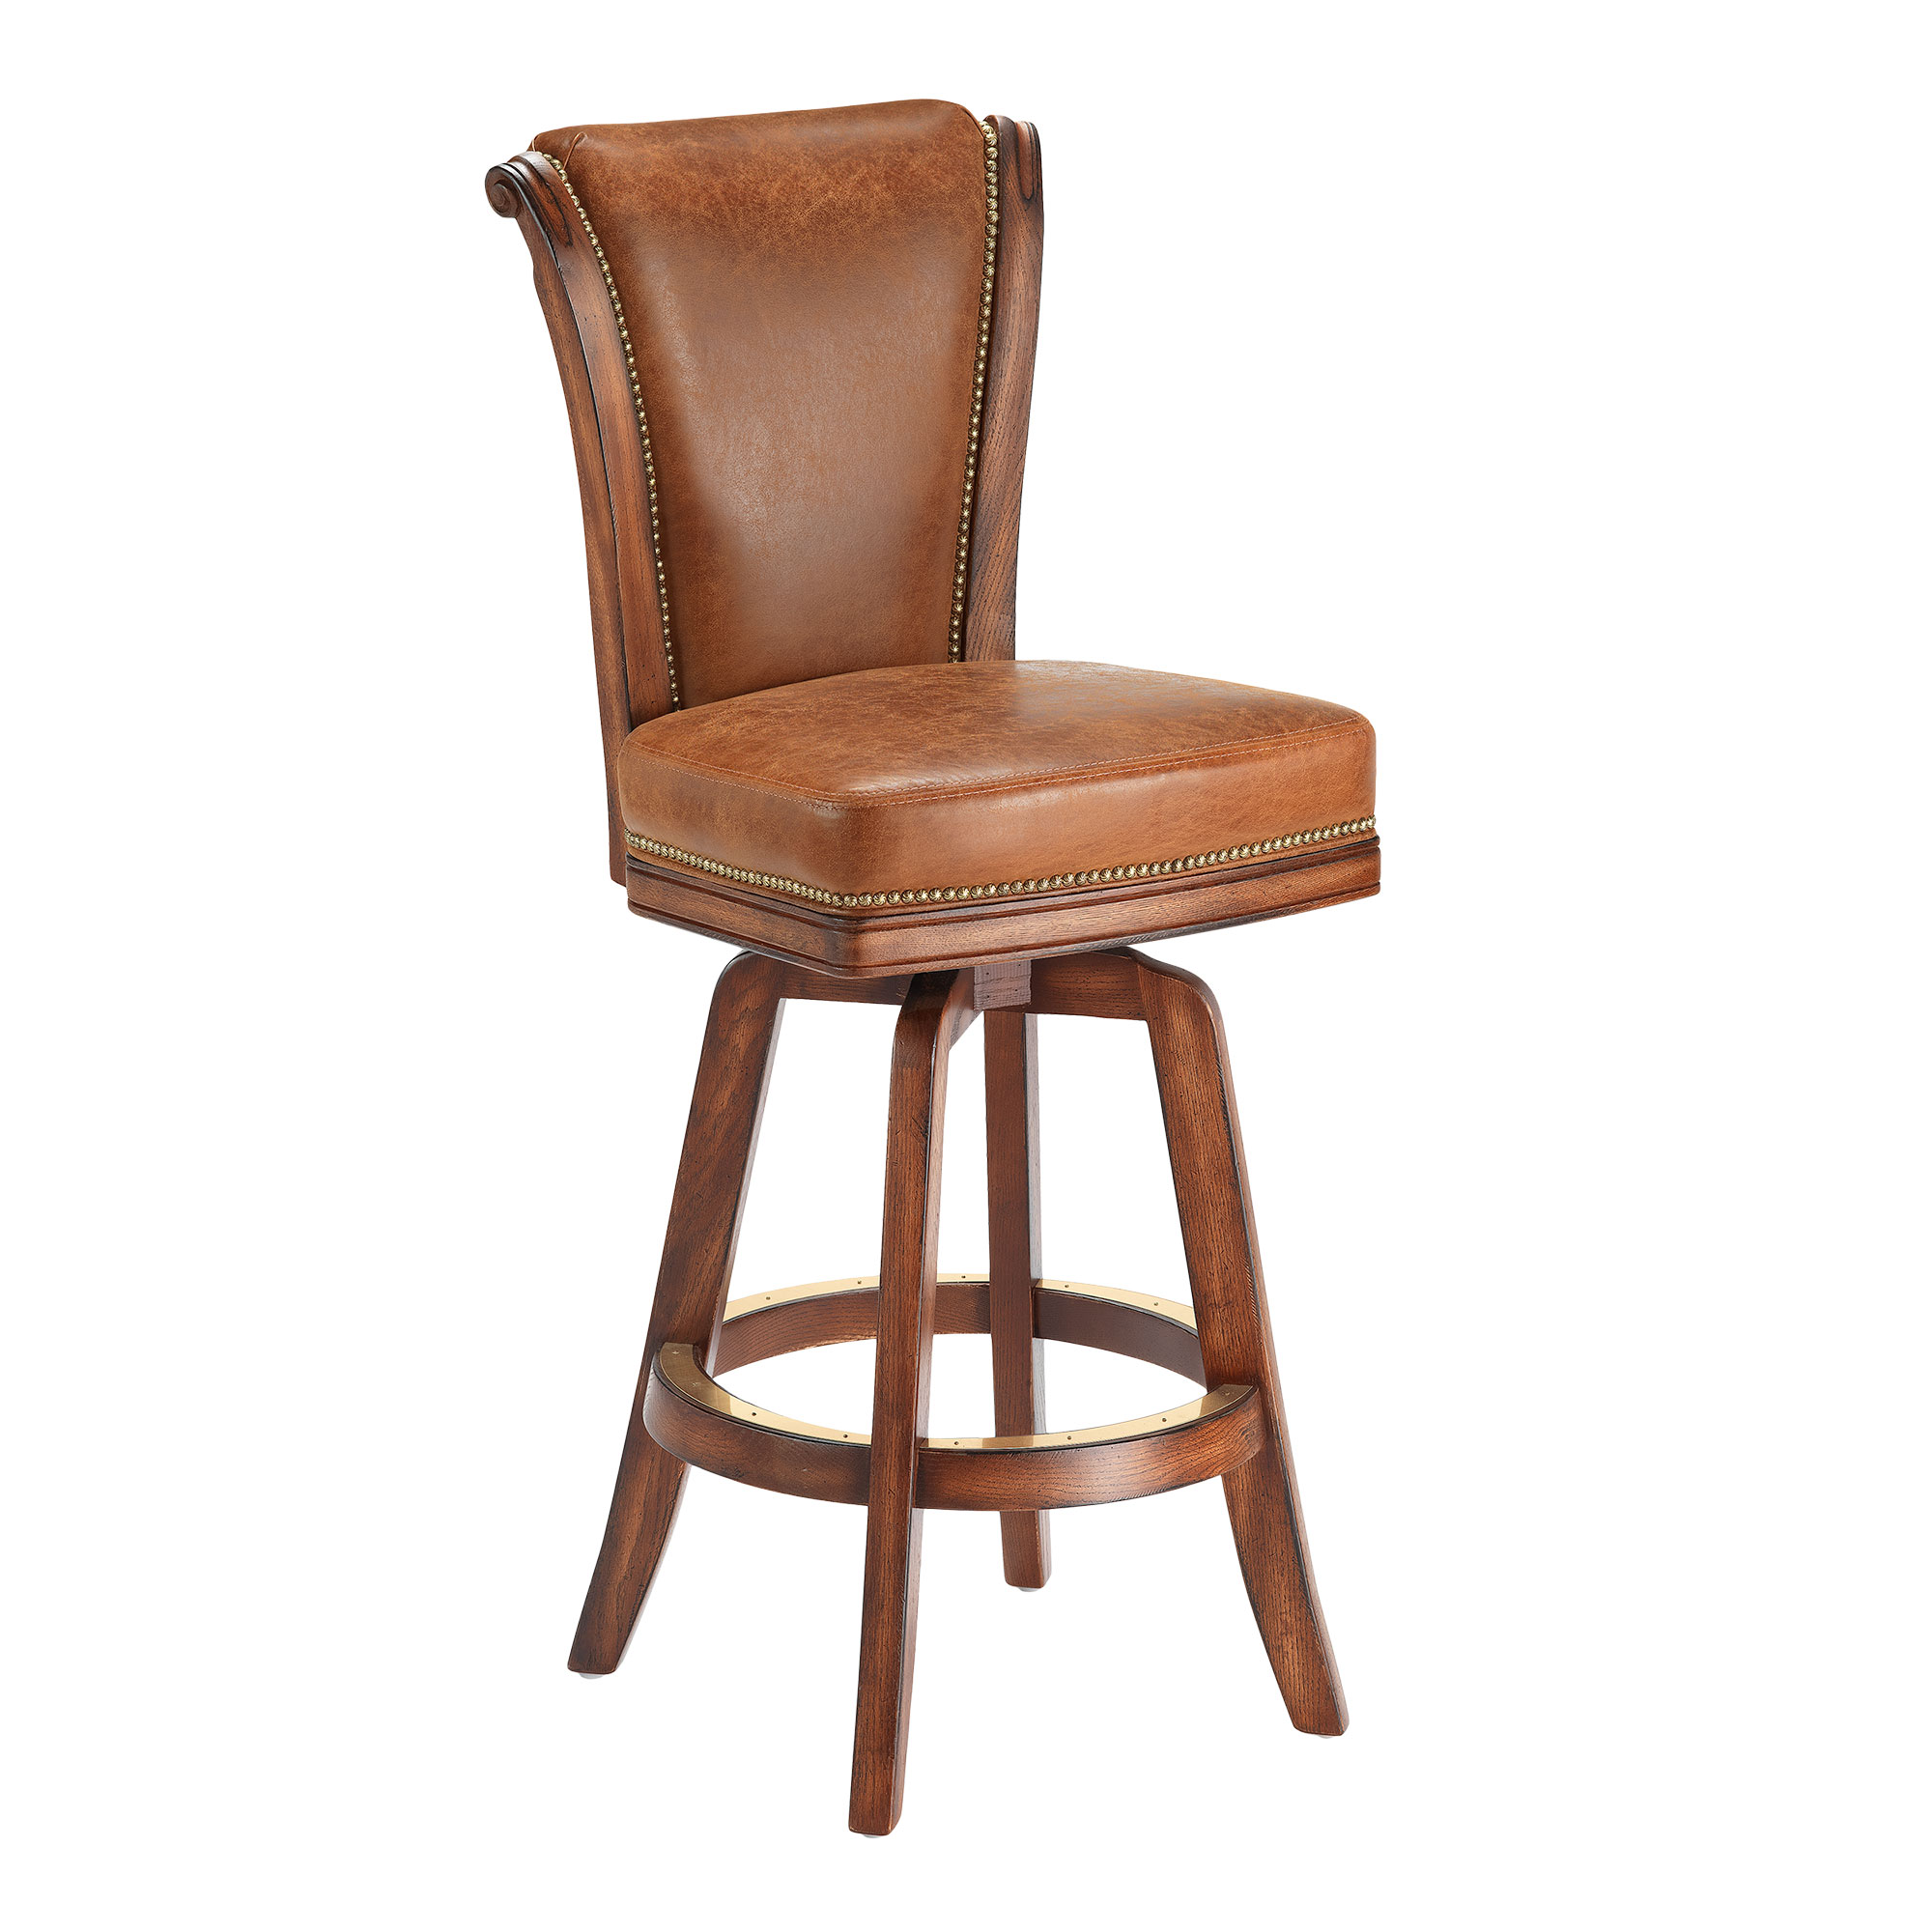 Classic (Oak) Flexback Barstool by Darafeev - Lou Rodman's ...